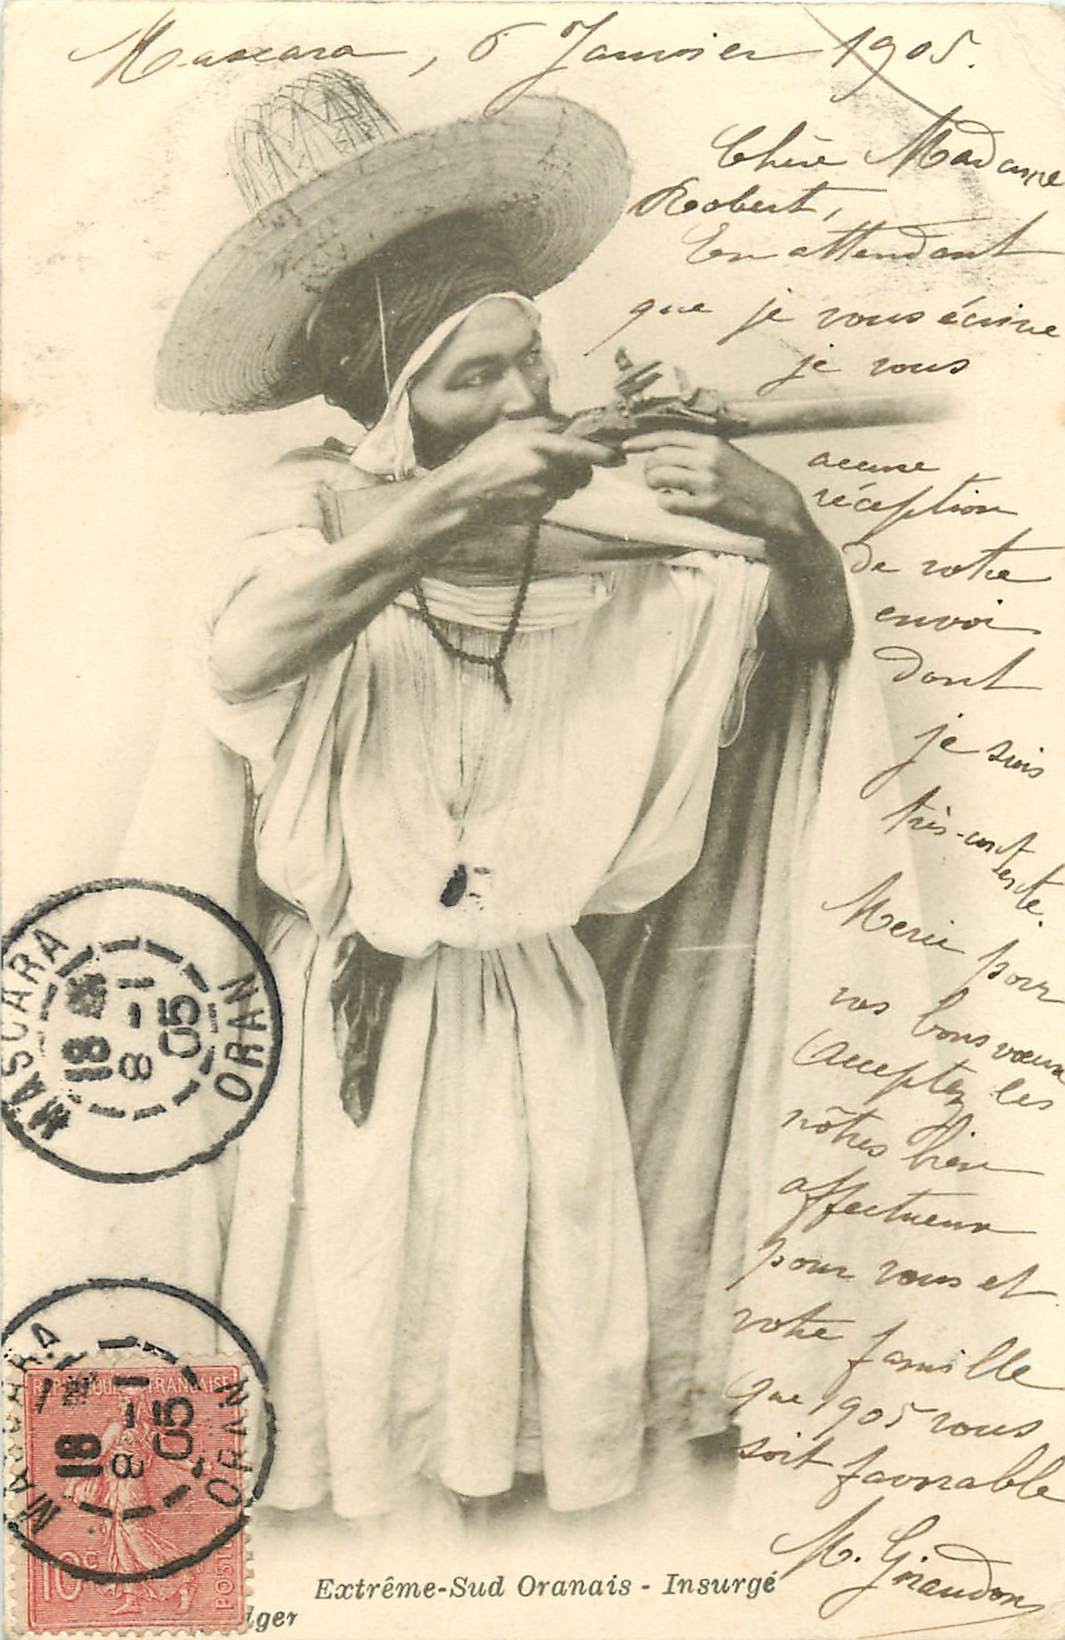 WW ALGERIE. Un Insurgé armé de l'Extrême Sud Oranais 1905